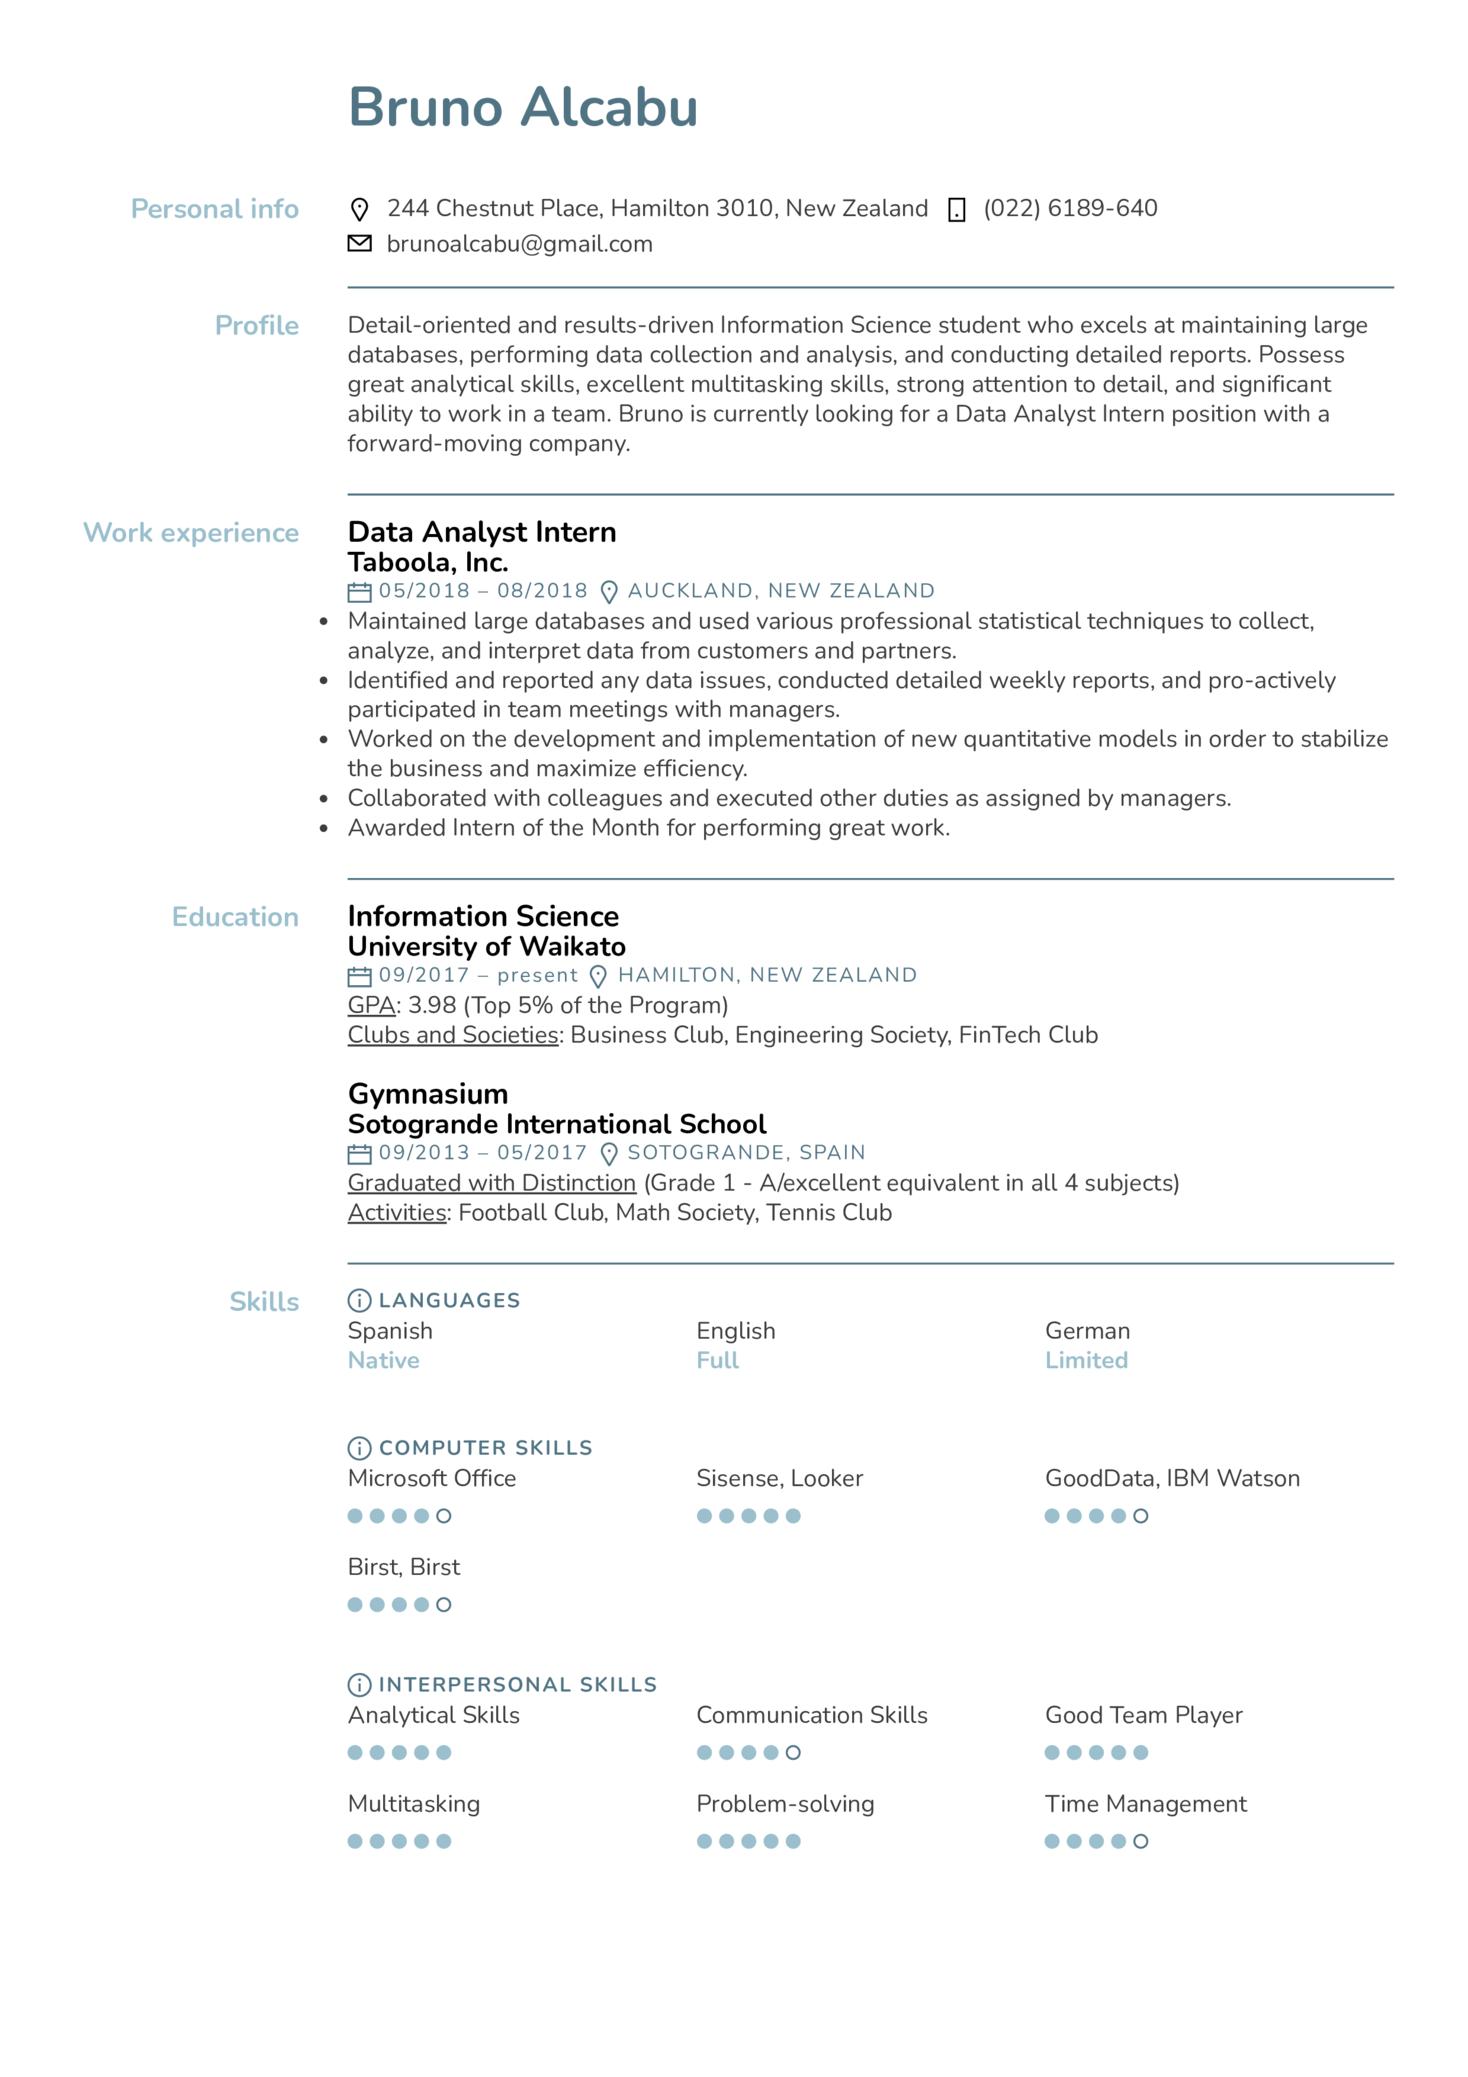 Data Analyst Intern Resume Example (Part 1)